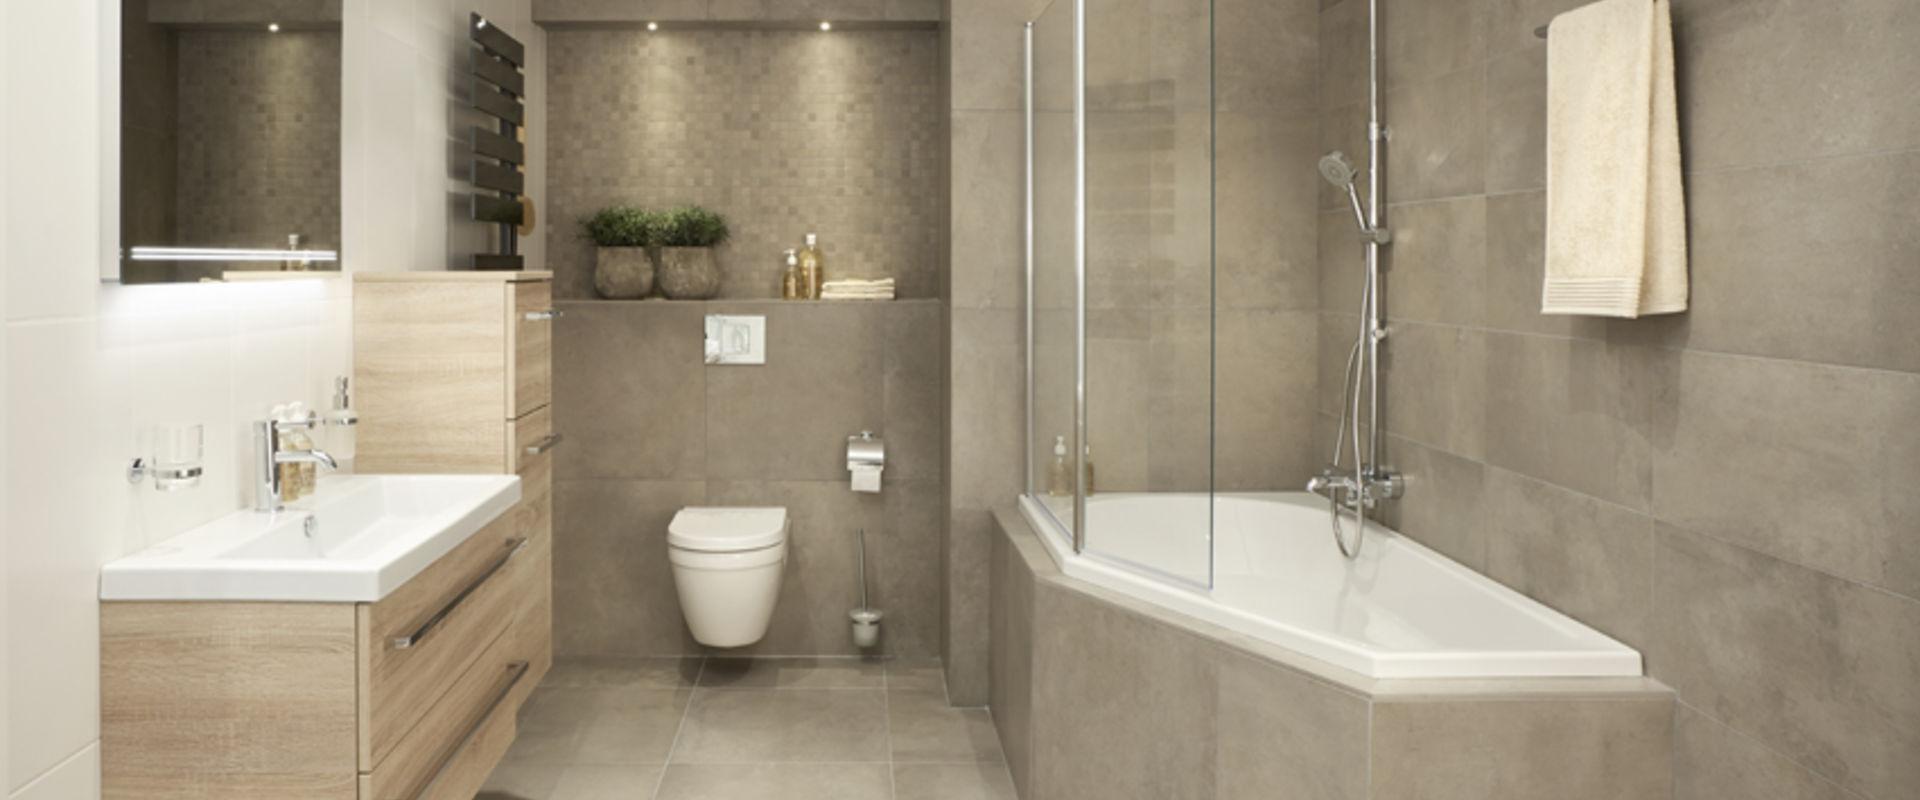 home badkamers badkamer kopen badkamerwinkels image